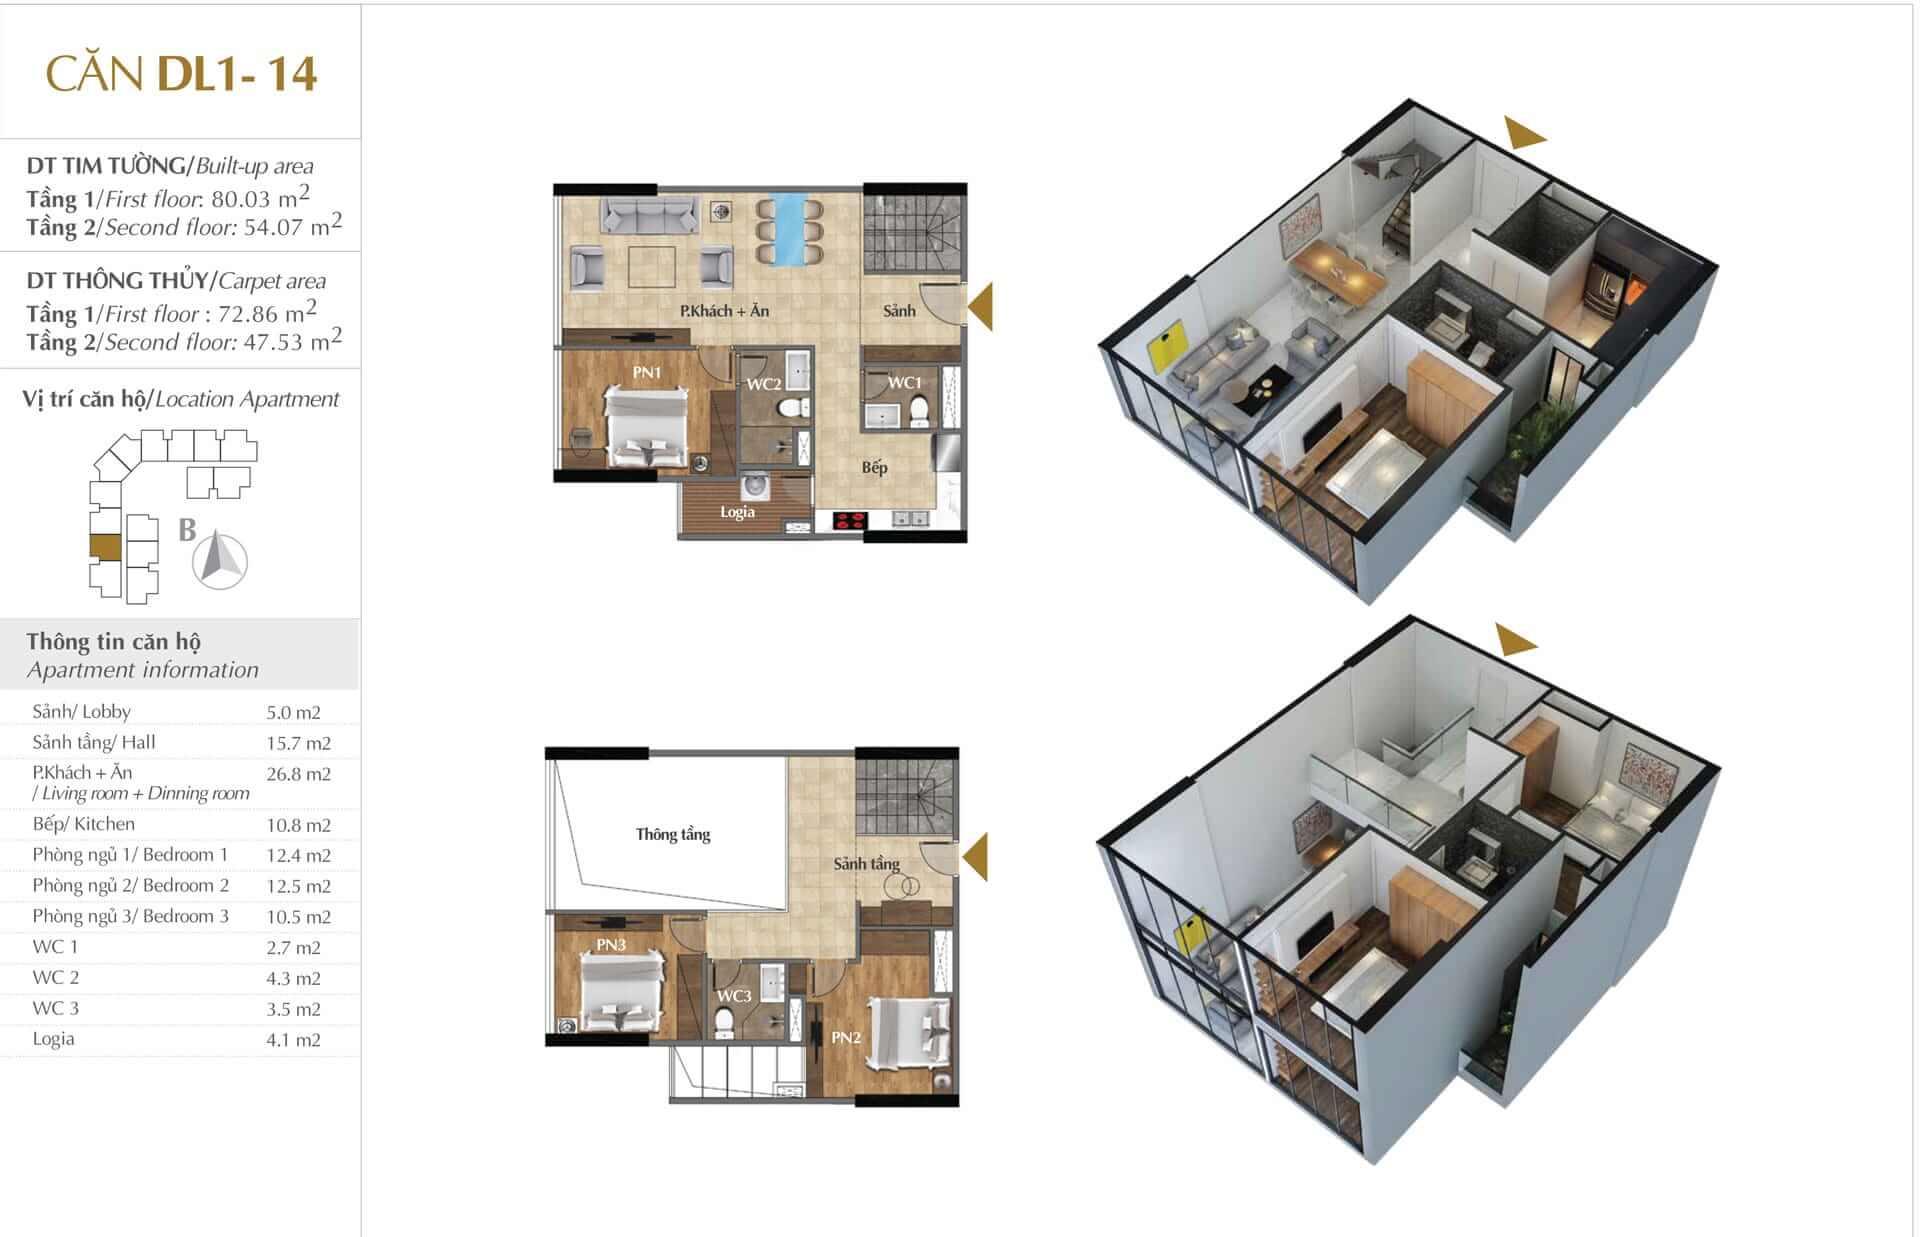 Thiết kế căn DL1 - 14